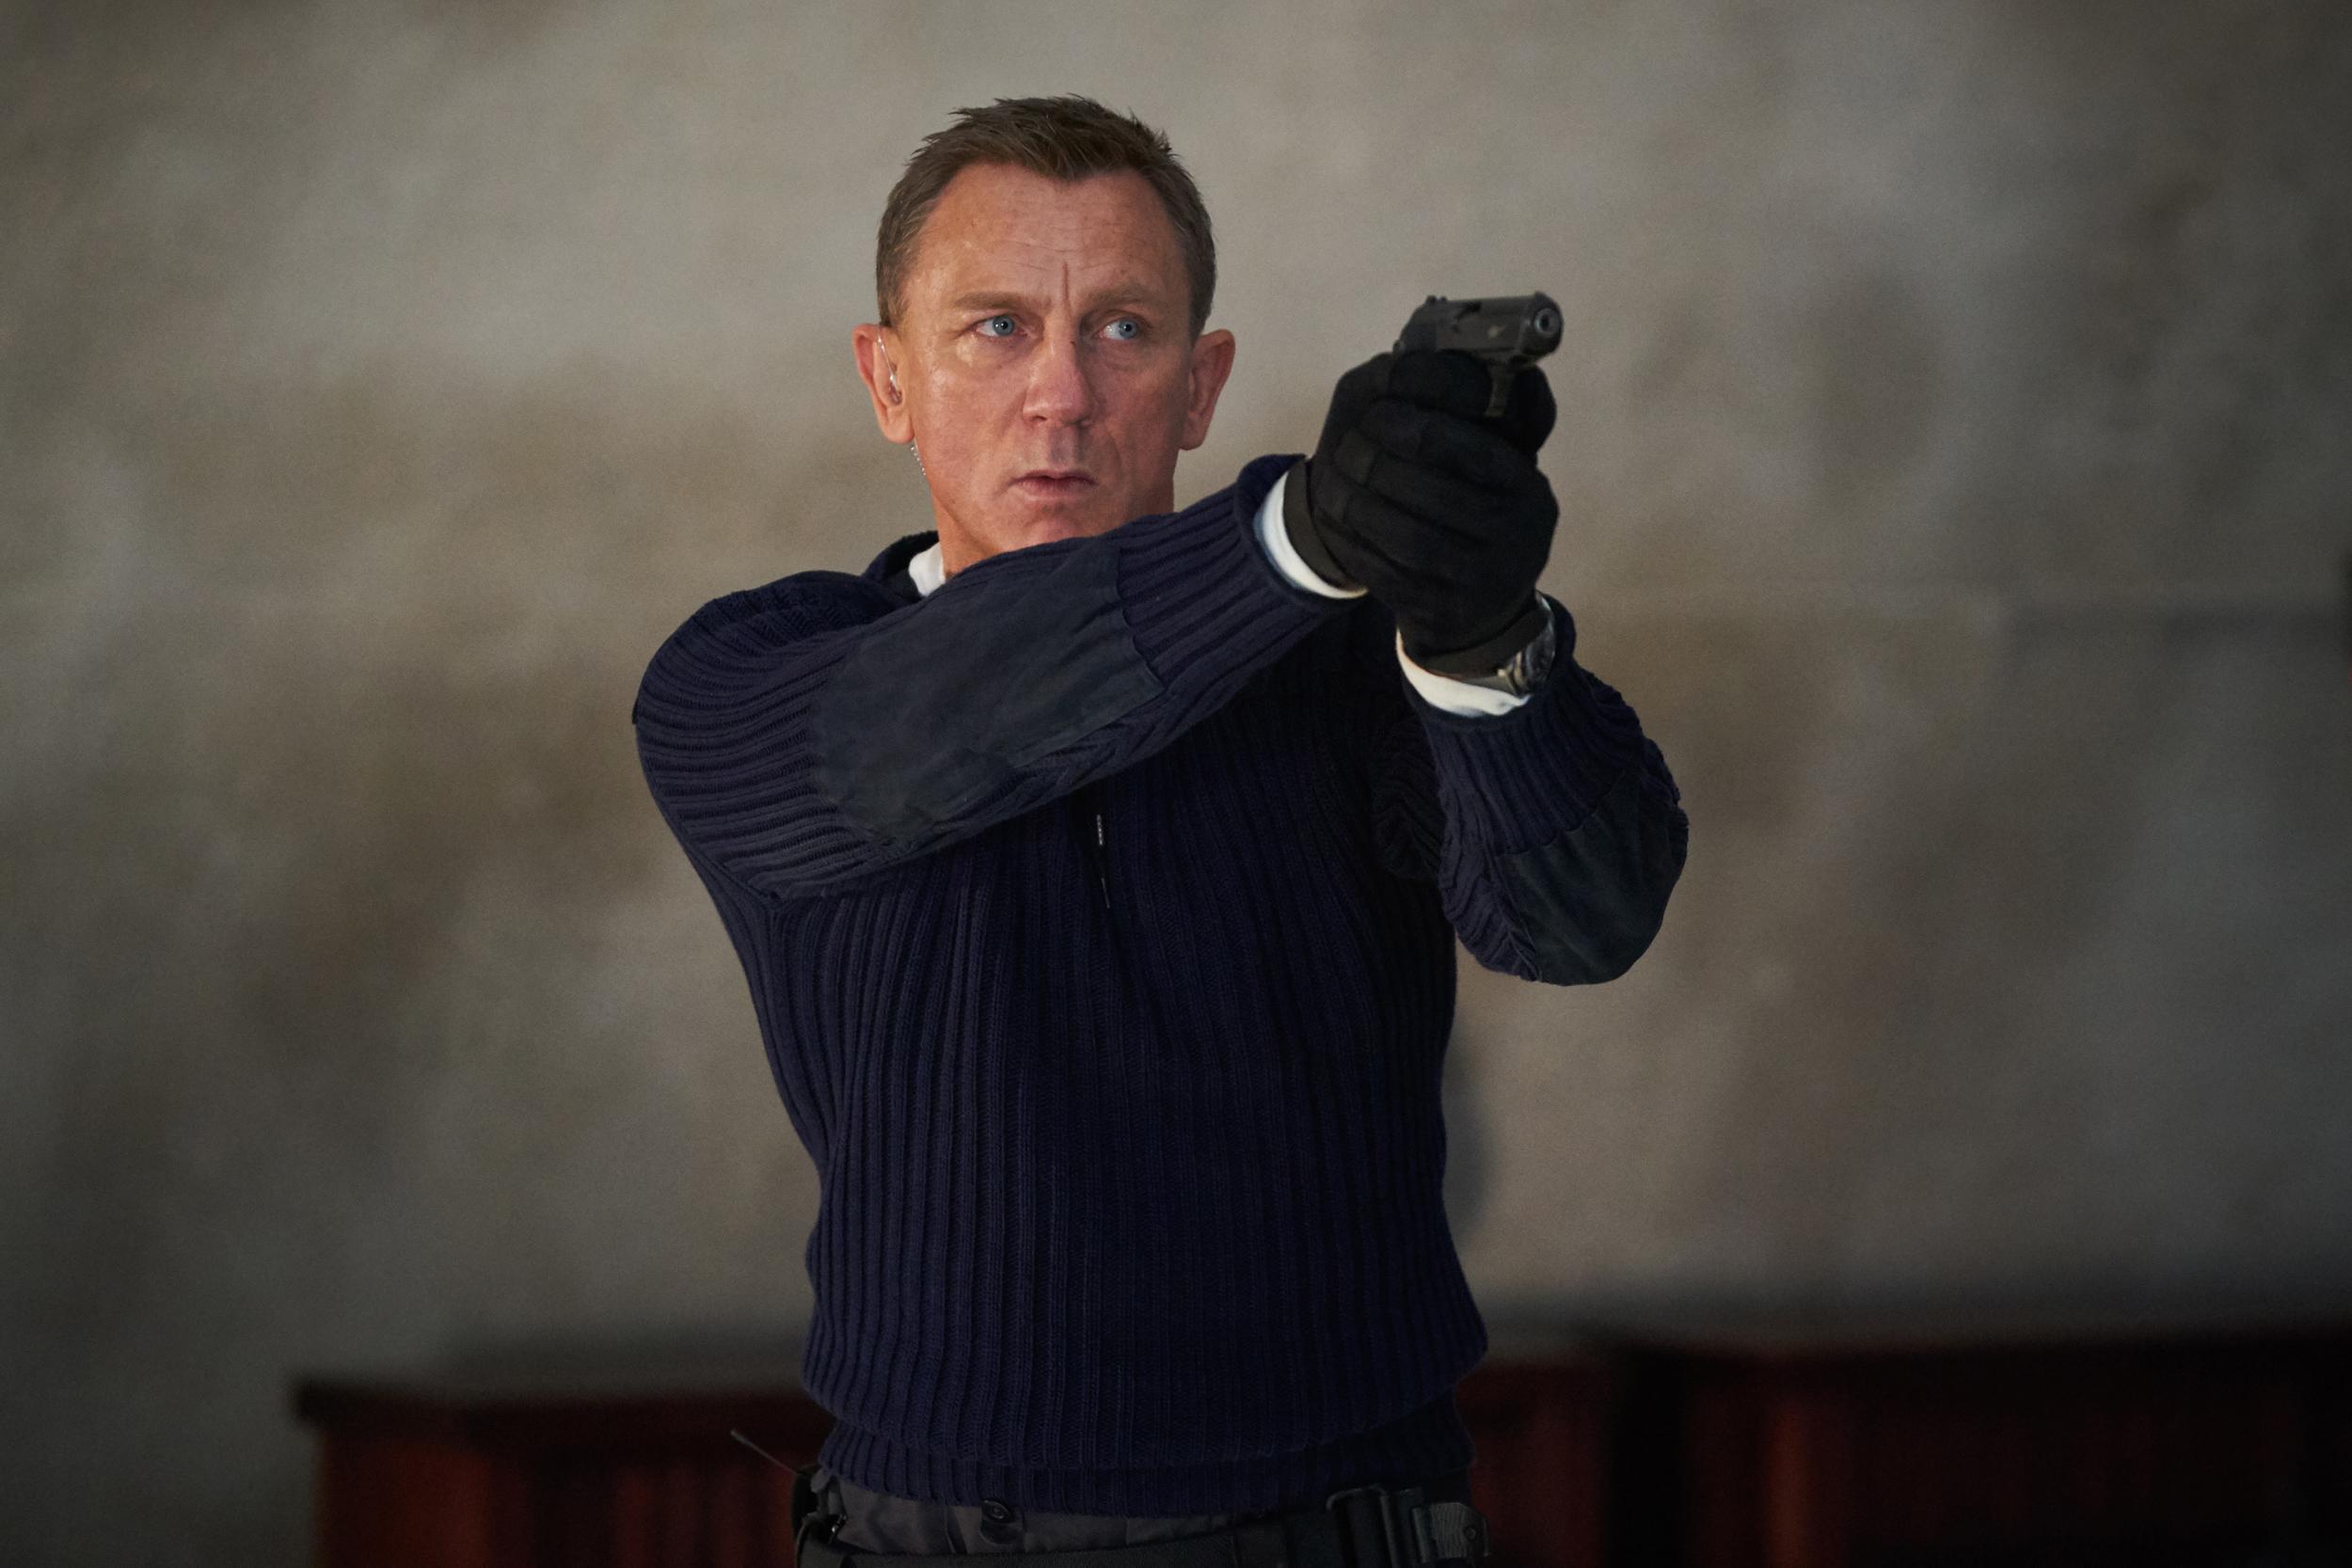 'He's a legend': Daniel Craig's new Bond movie is his last. What's next for the franchise?